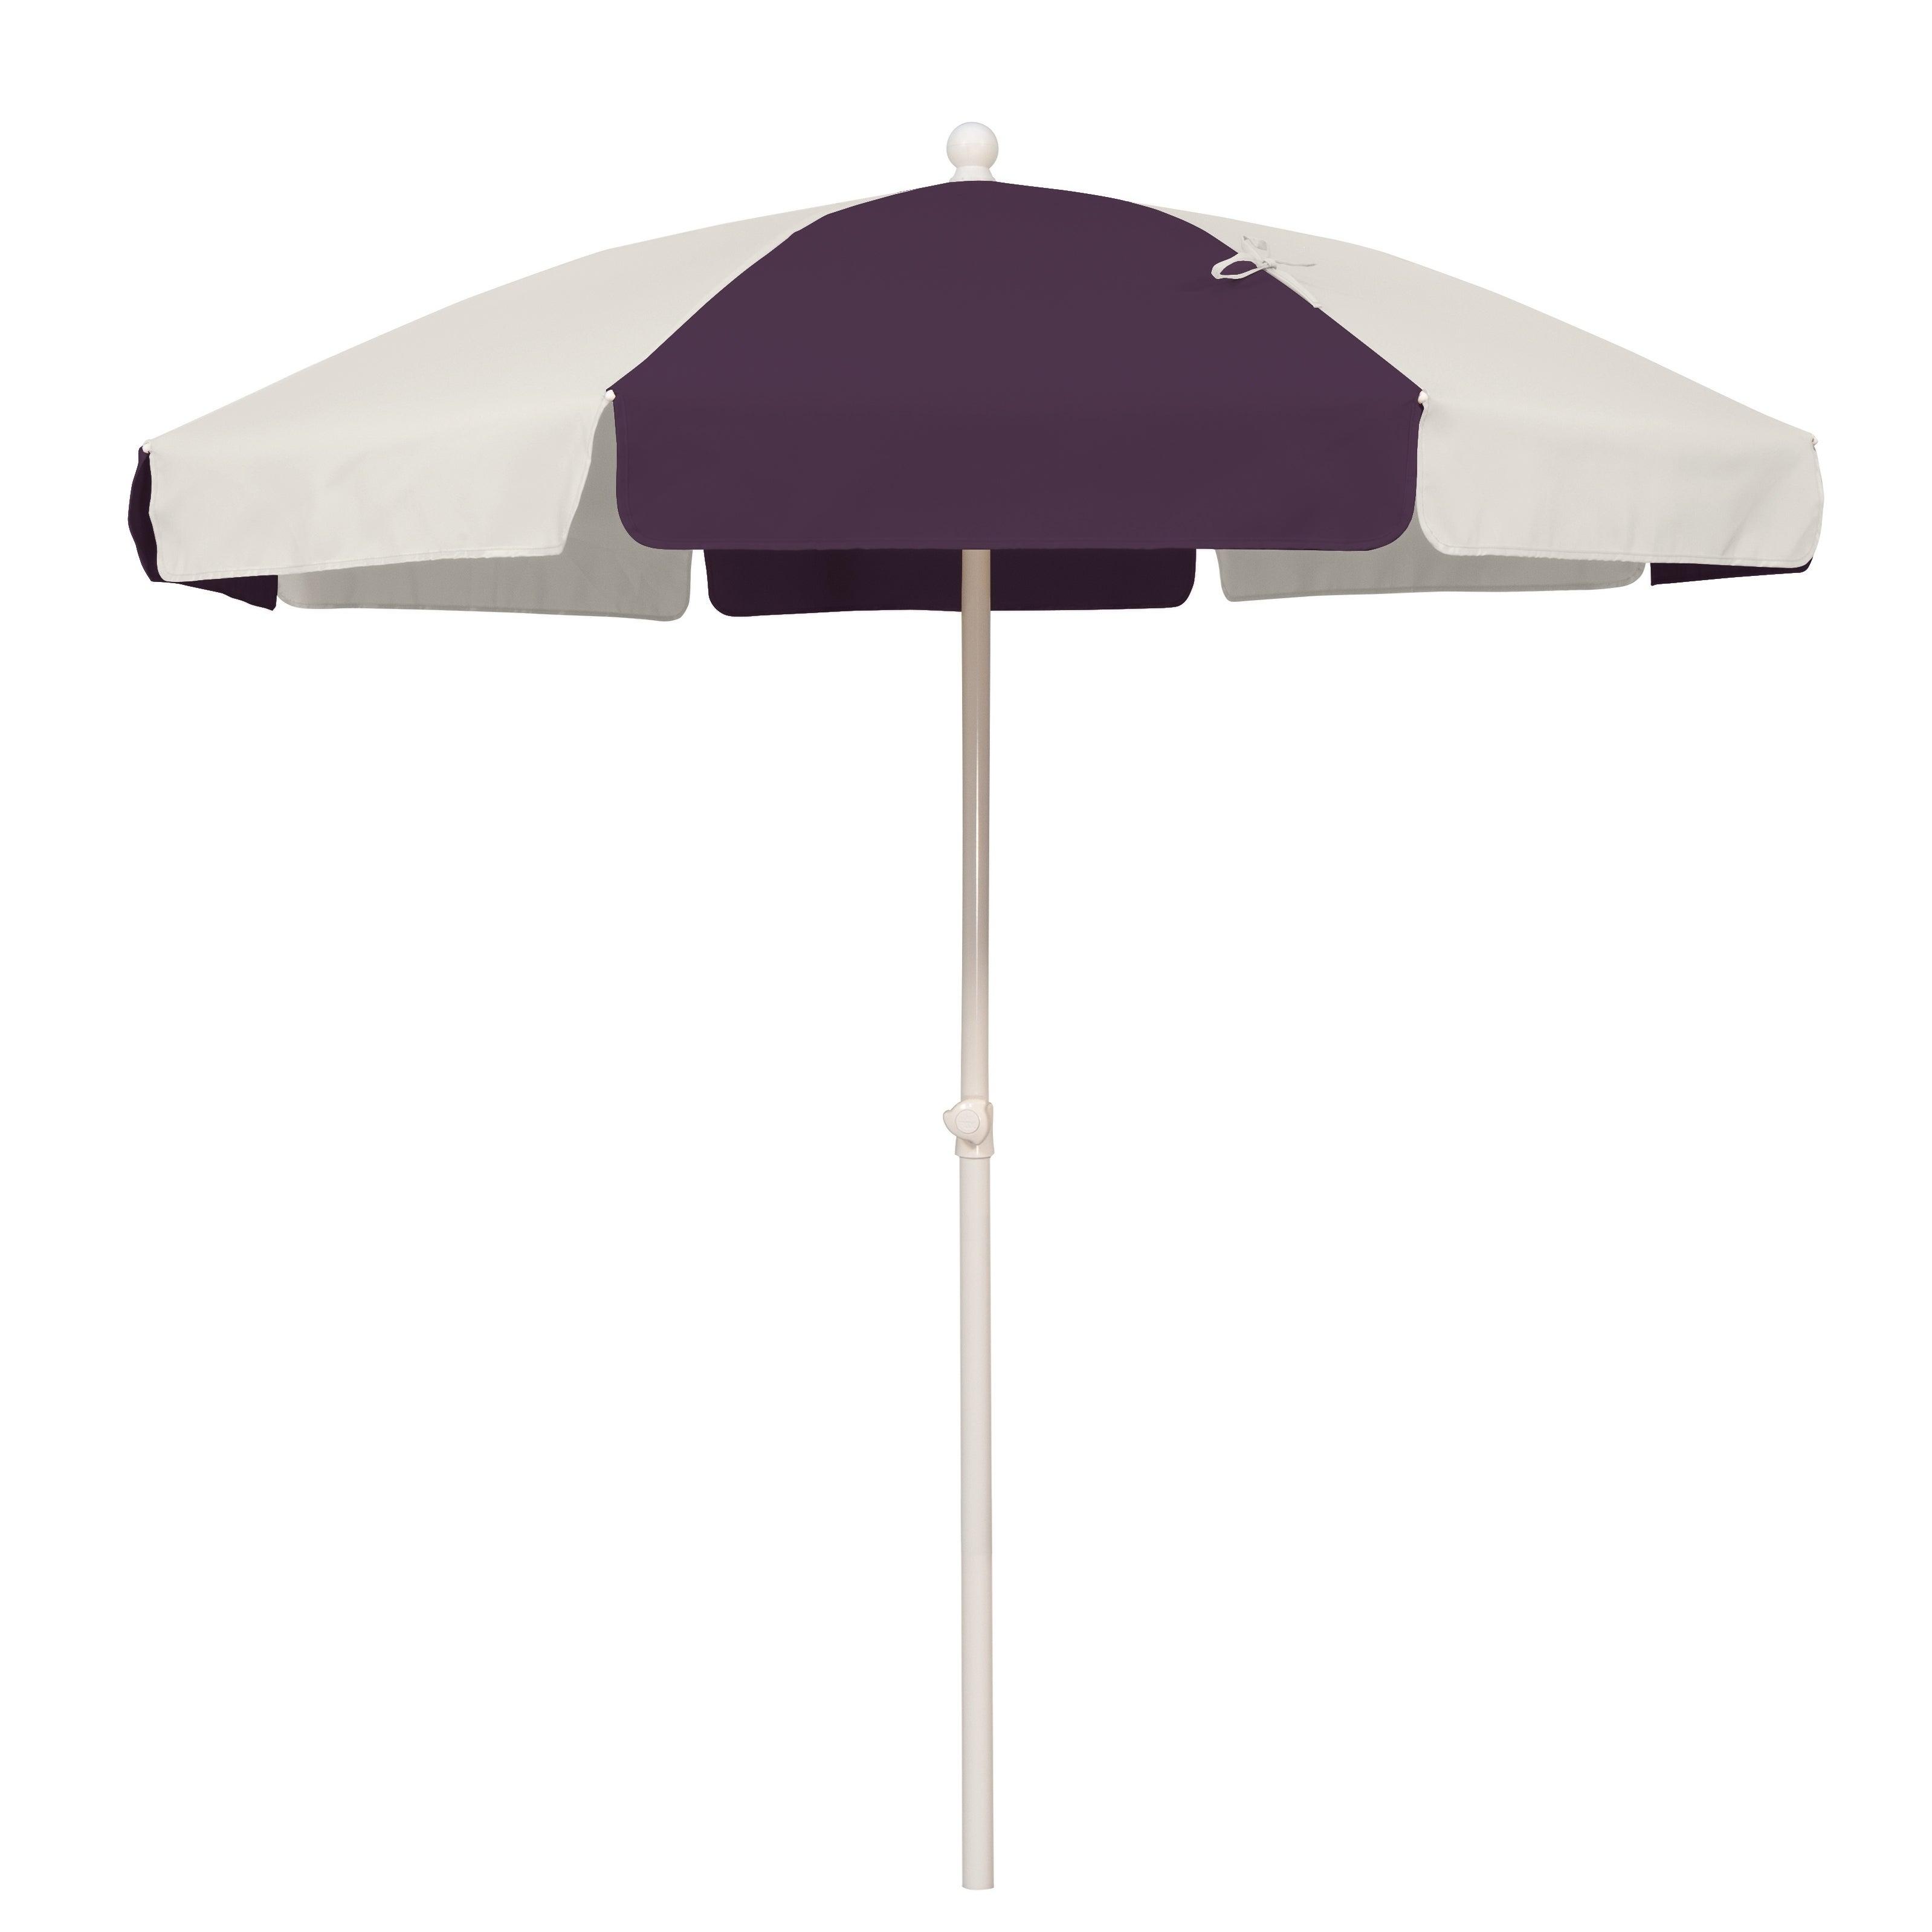 Simplyshade Tahiti 6 5 Beach Umbrella With Fiberglass Ribs And Sand Anchor On Sale Overstock 28442965